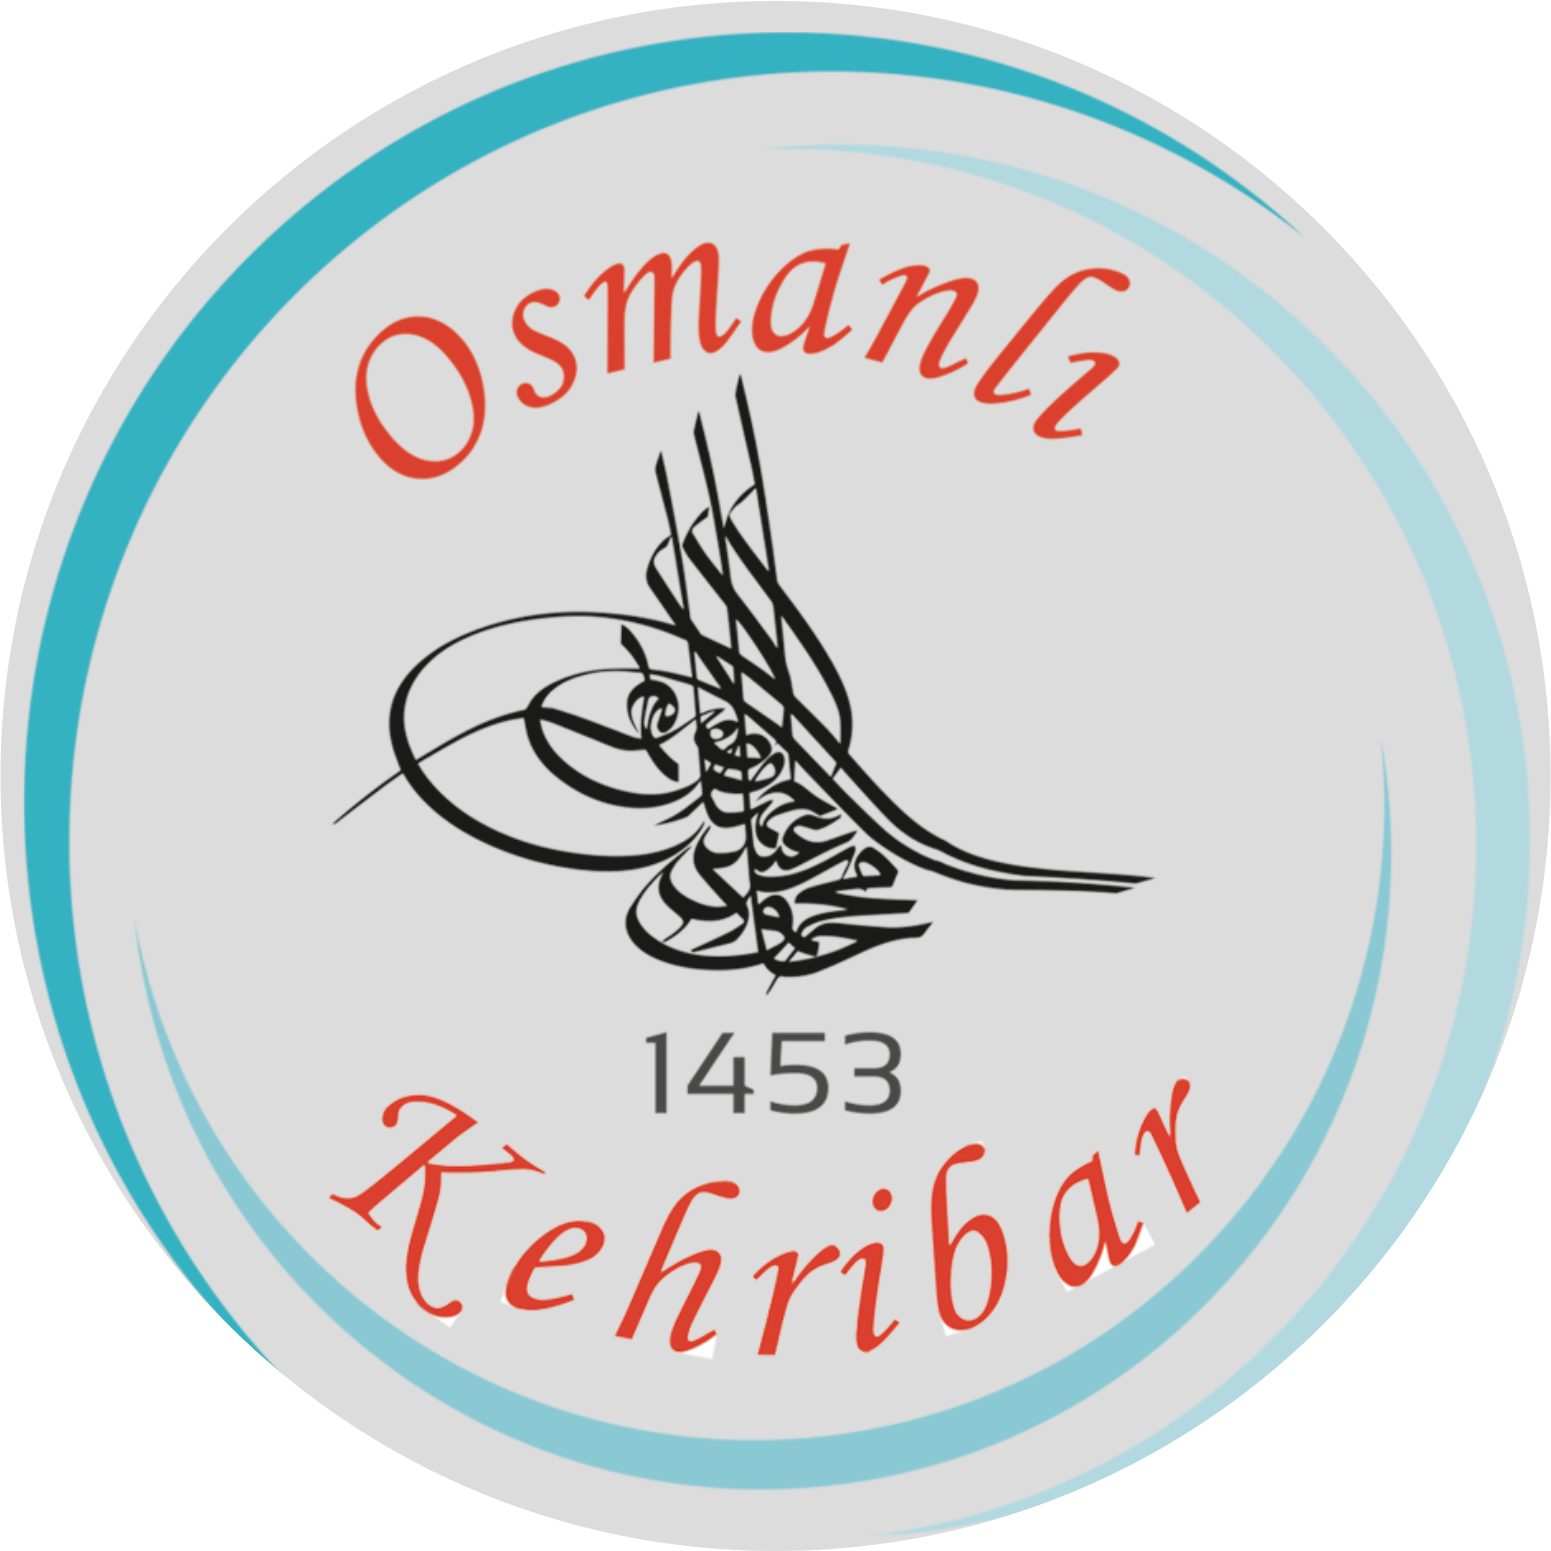 Osmanlı Kehribar 1453